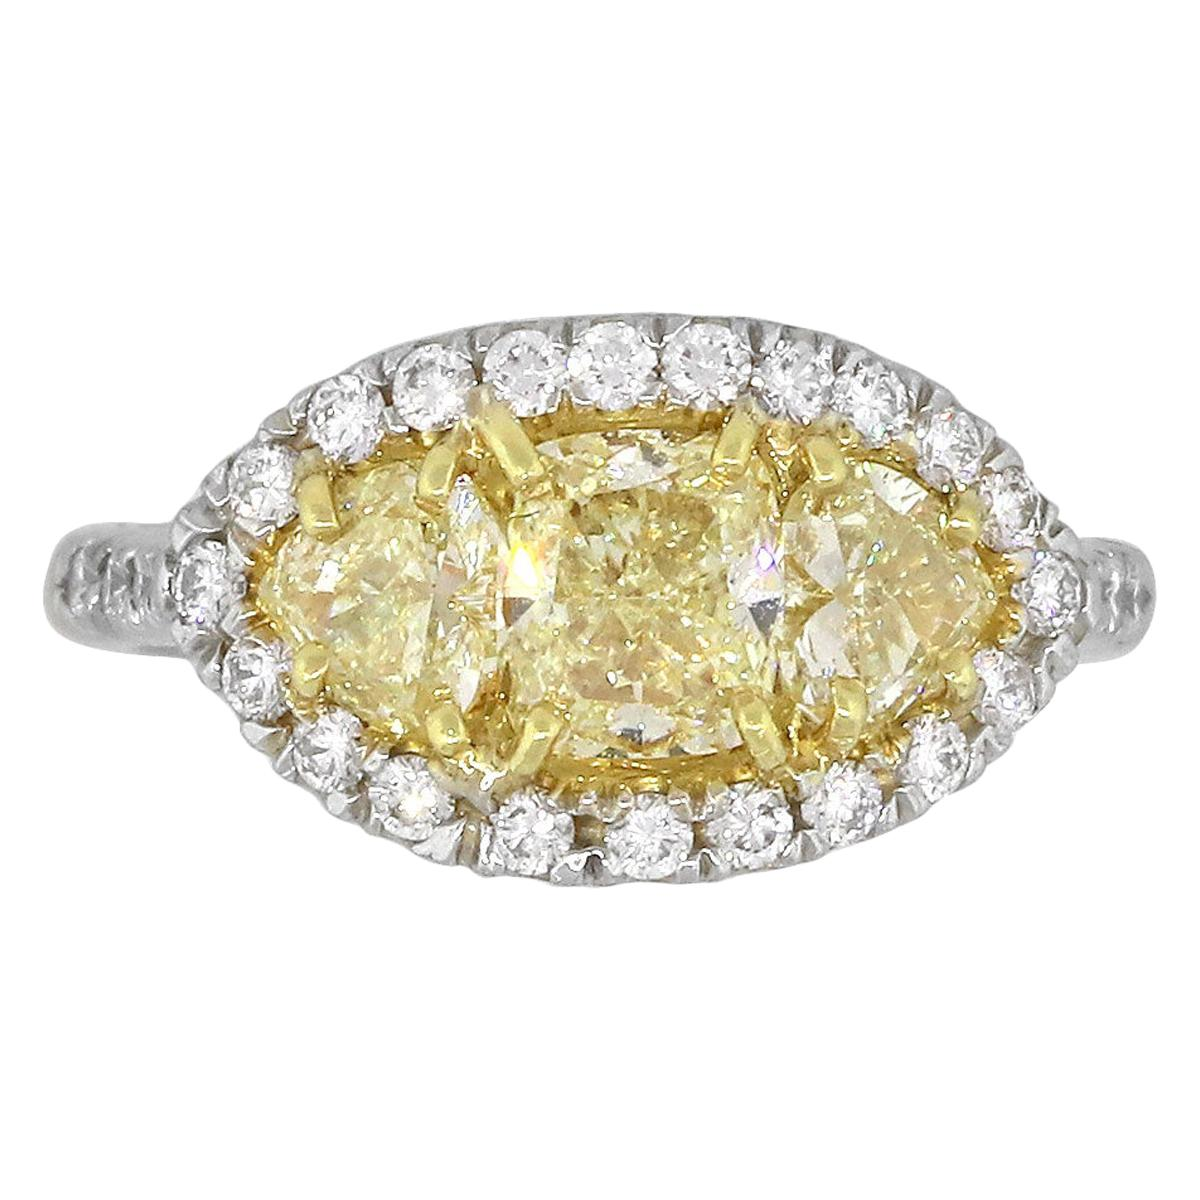 18 Karat White Gold 2.33 Carat Diamond Three-Stone Halo Ring